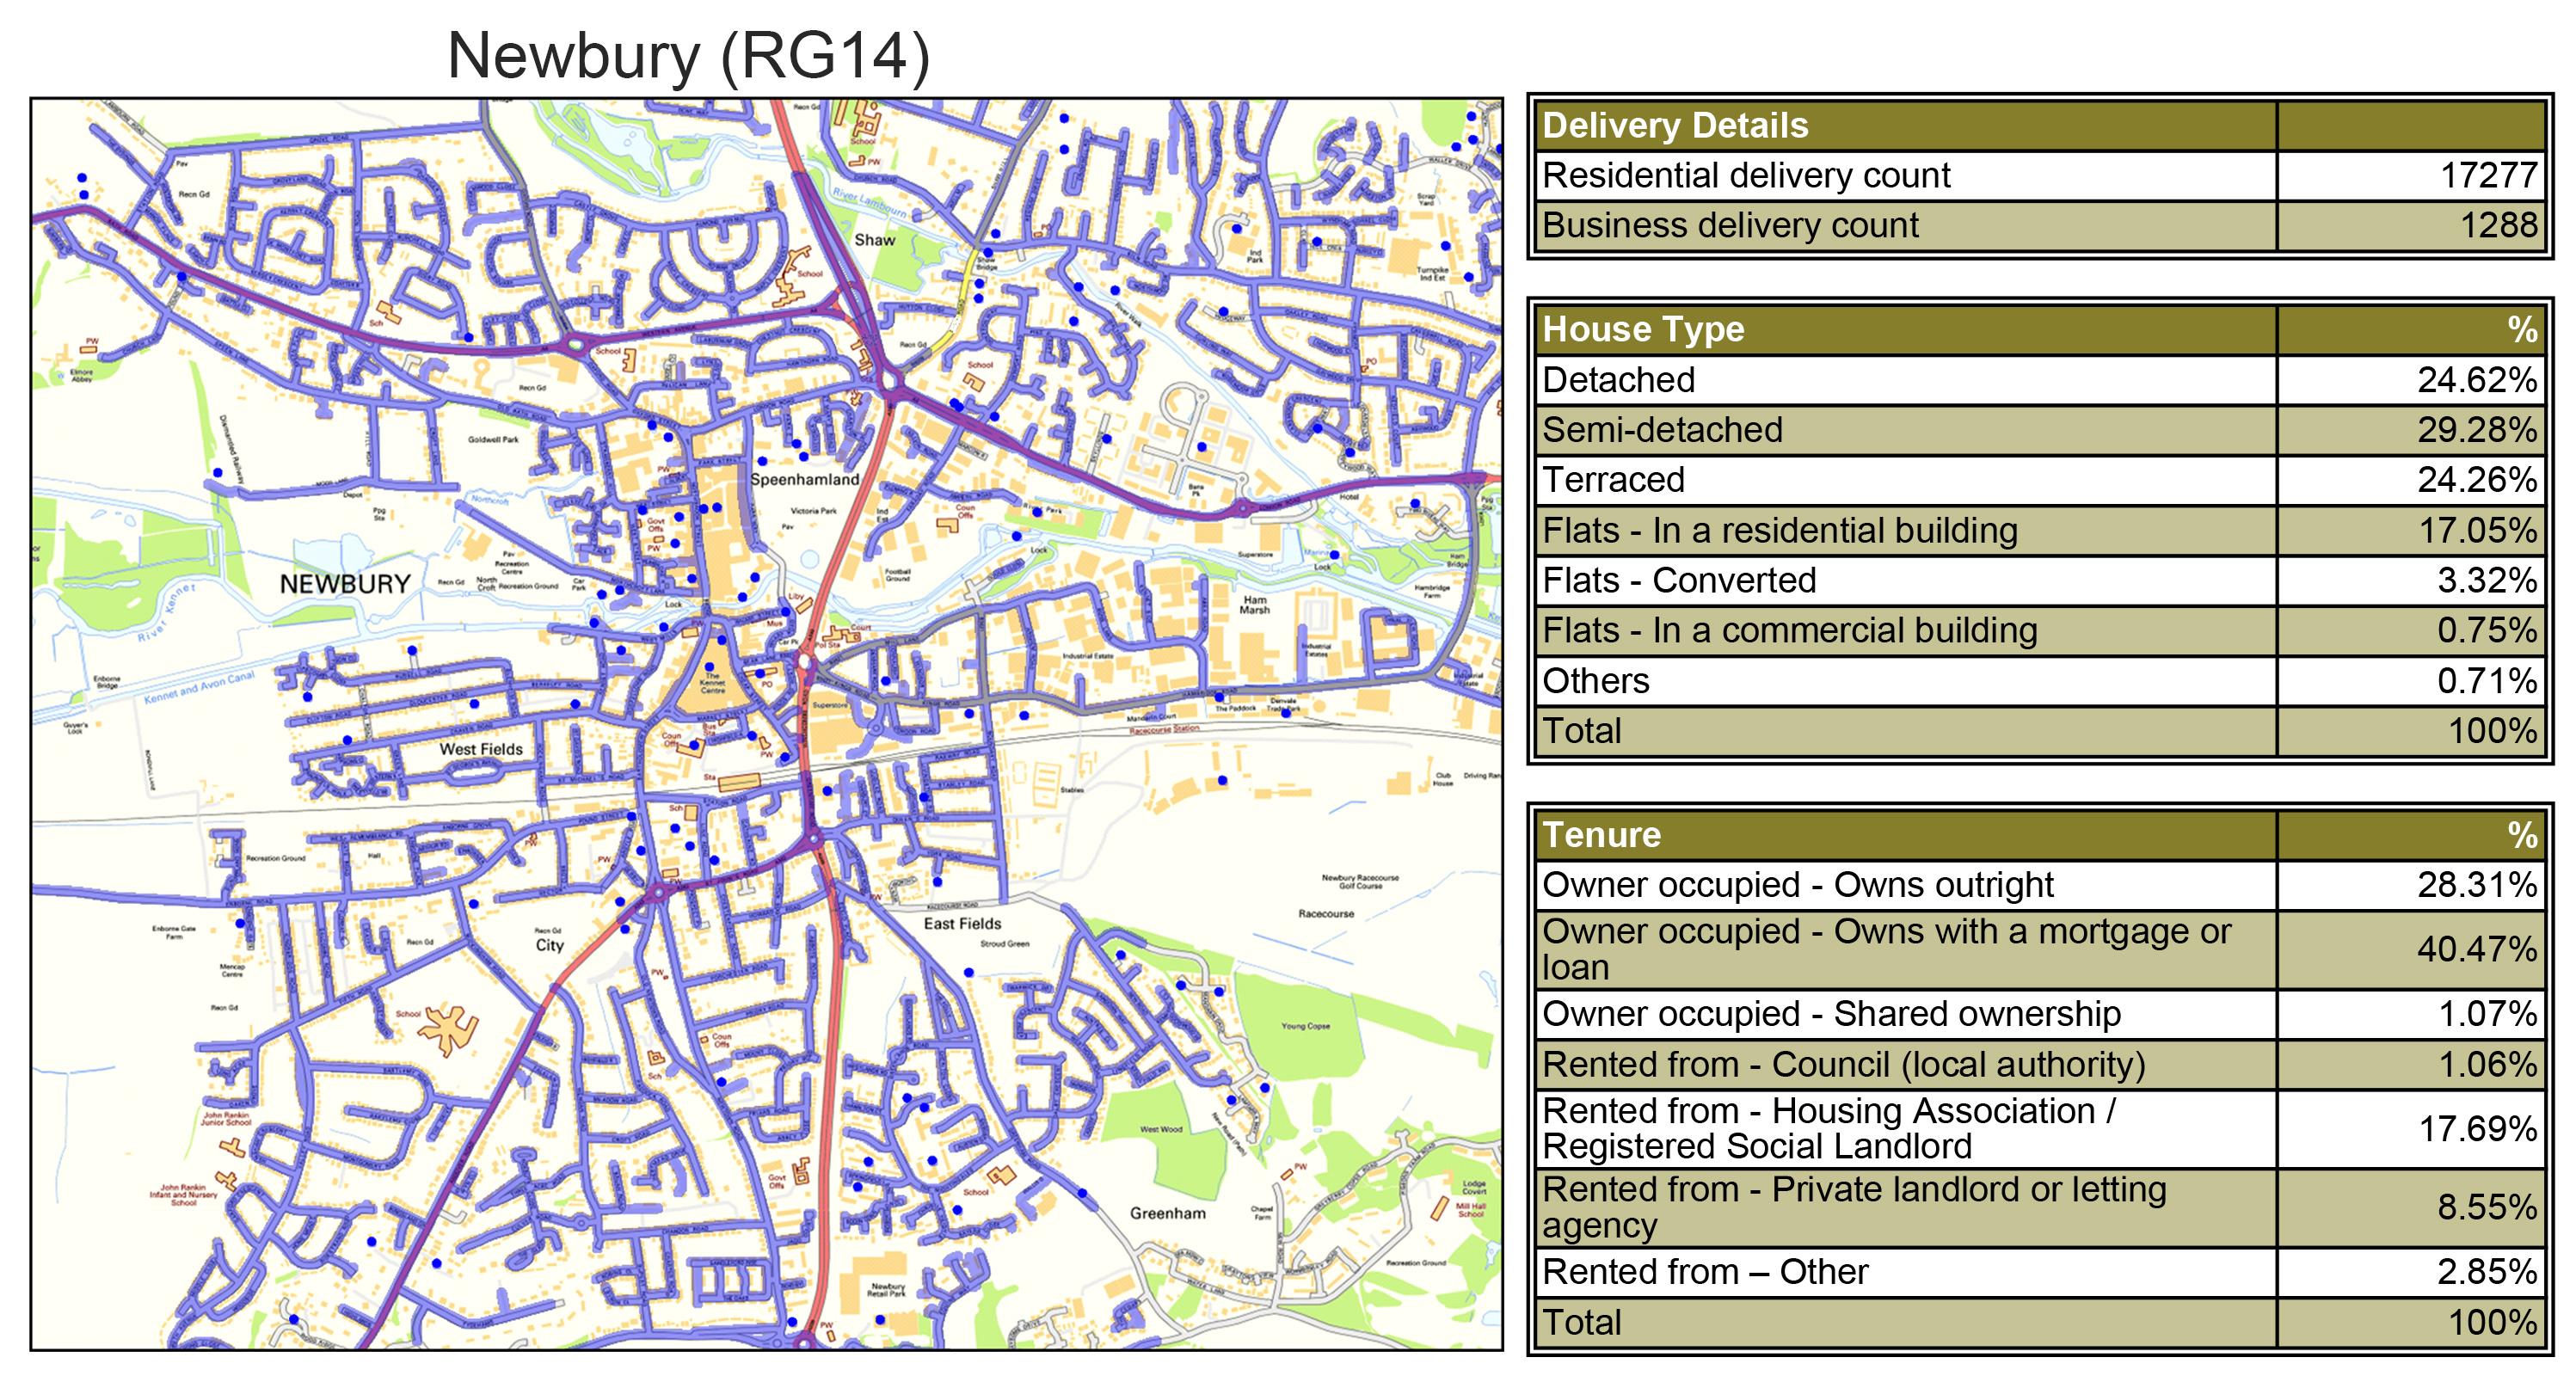 Leaflet Distribution Newbury - Geoplan Image